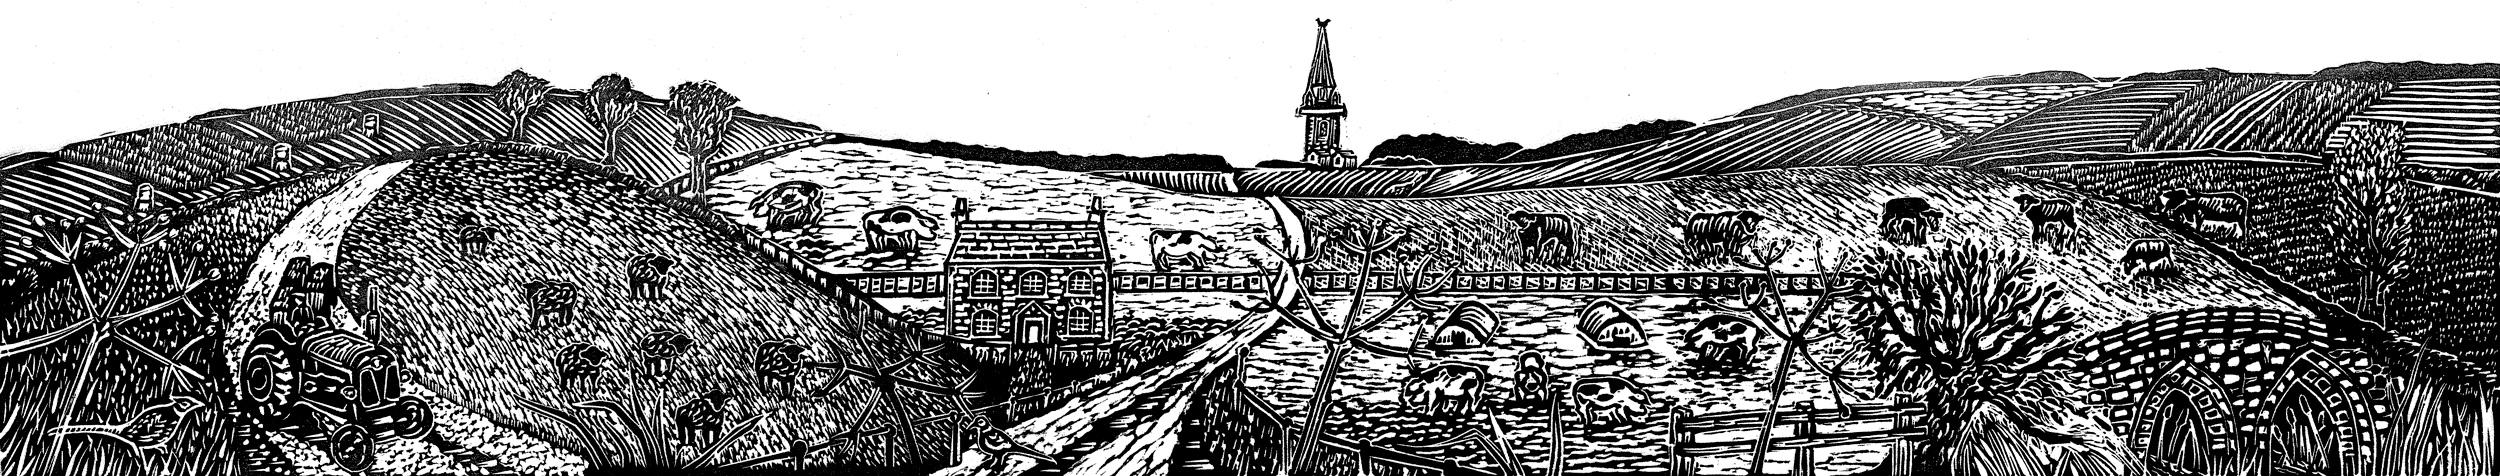 Todenham-Manor-Farm---Linocut-Landscape-Web.jpg